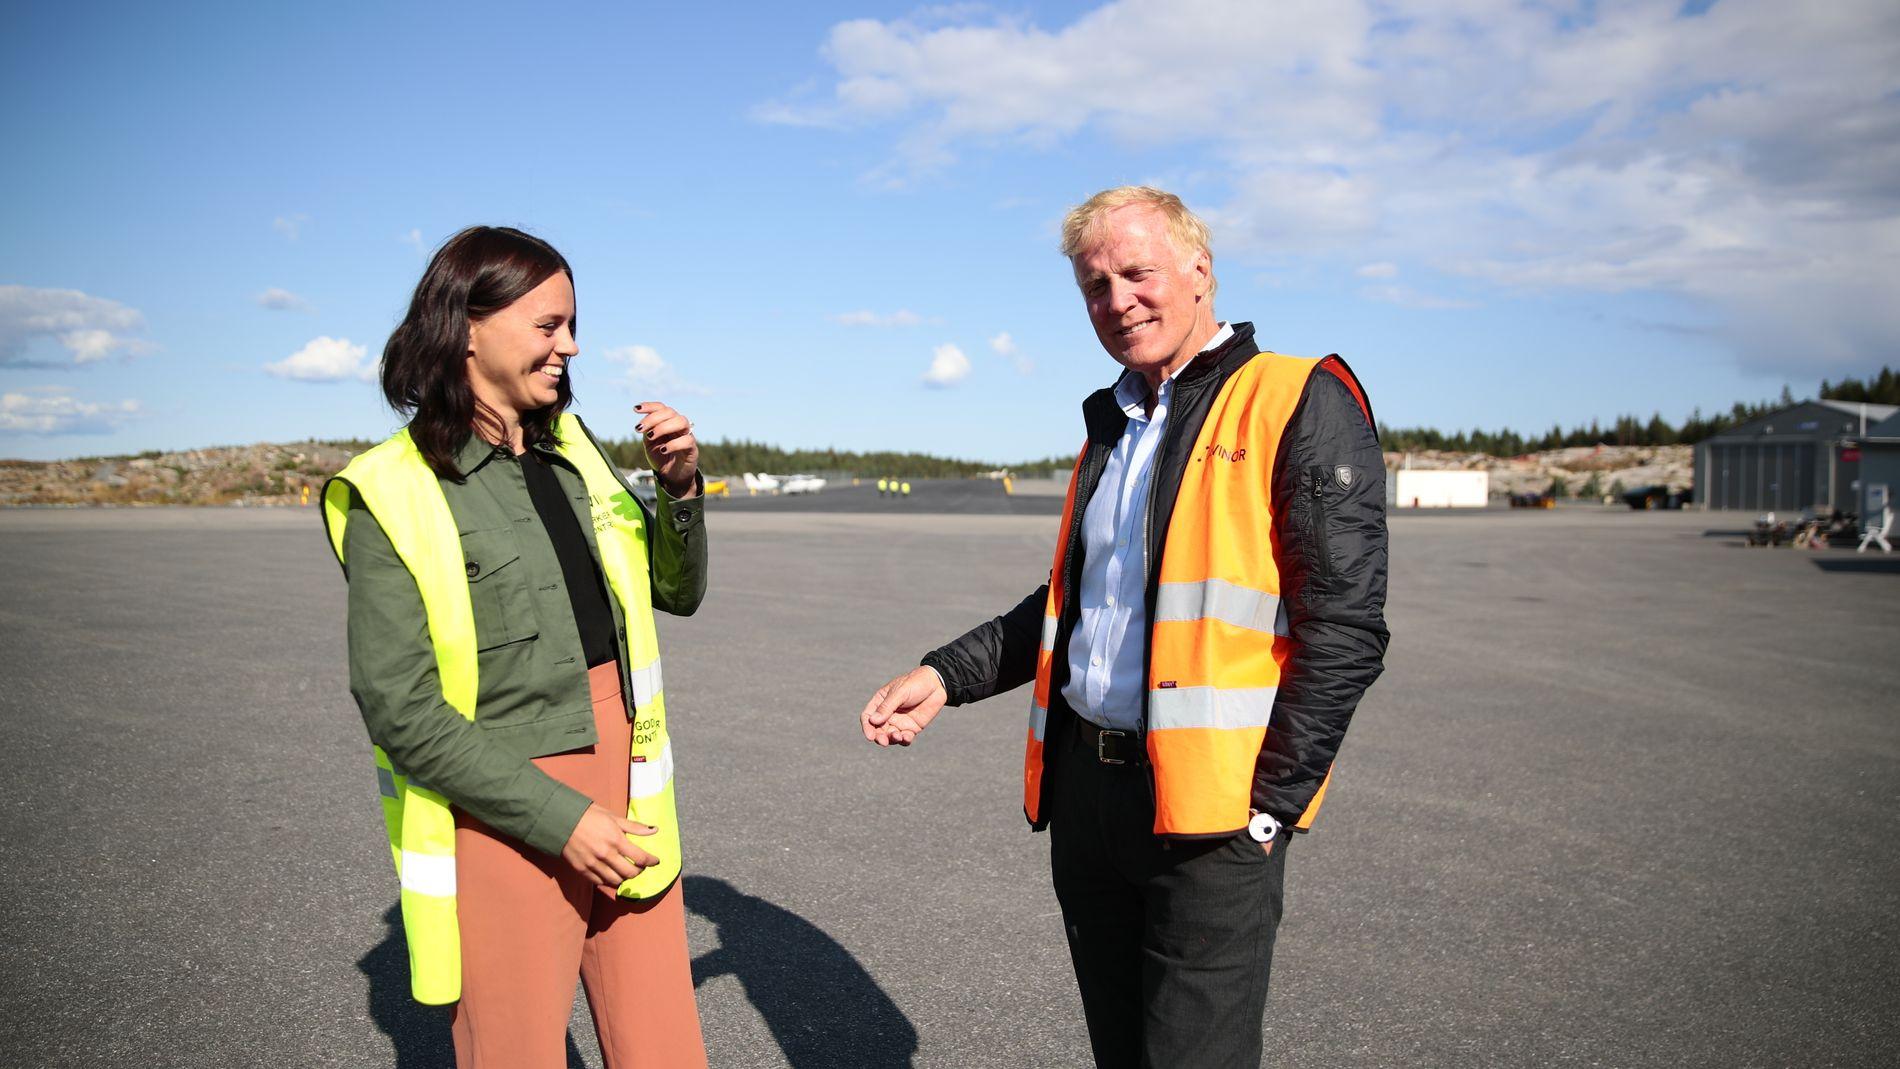 OM BORD: Statssekretær Aase Marthe J. Horrigmo var passasjer da Avinors konsernsjef Dag Falk-Petersen måtte nødlandet flyet de to satt i onsdag ettermiddag.